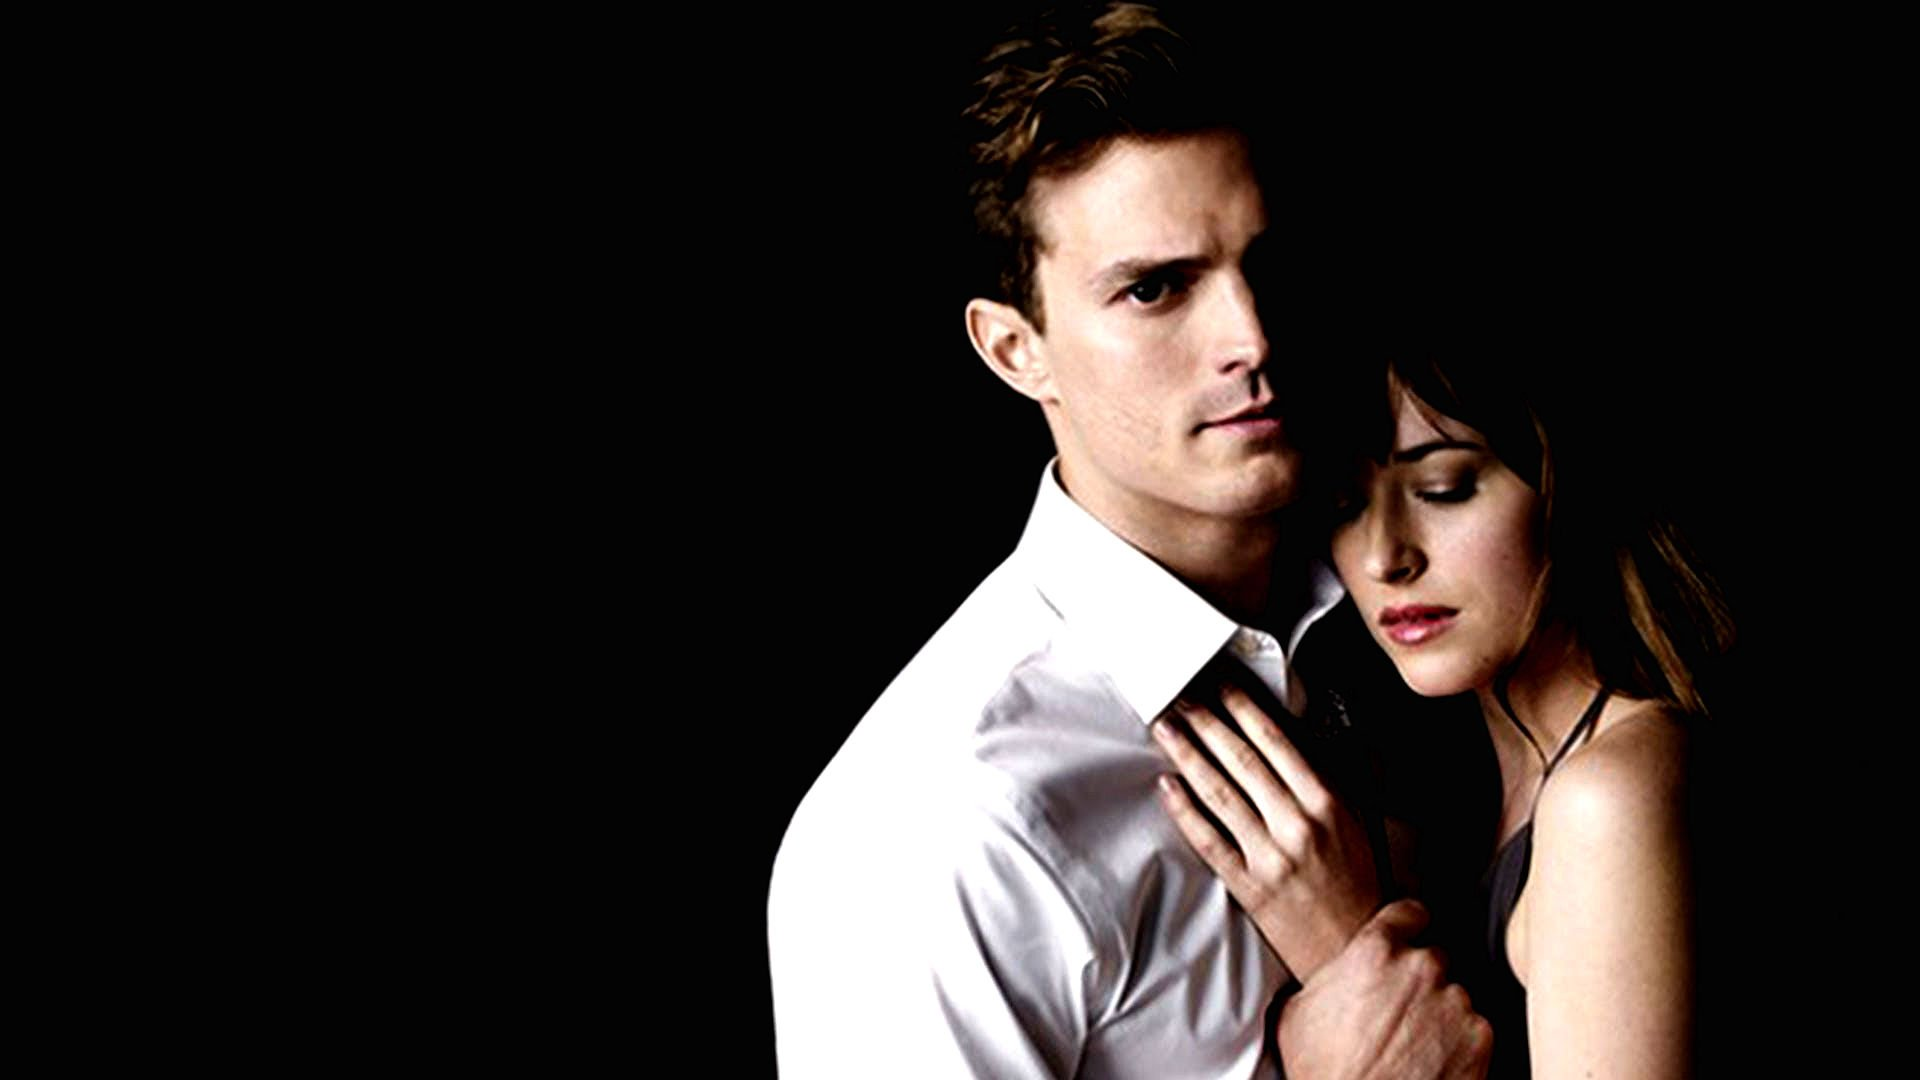 Fifty shades of grey drama romance book wallpaper - Fifty shades of grey movie wallpaper ...